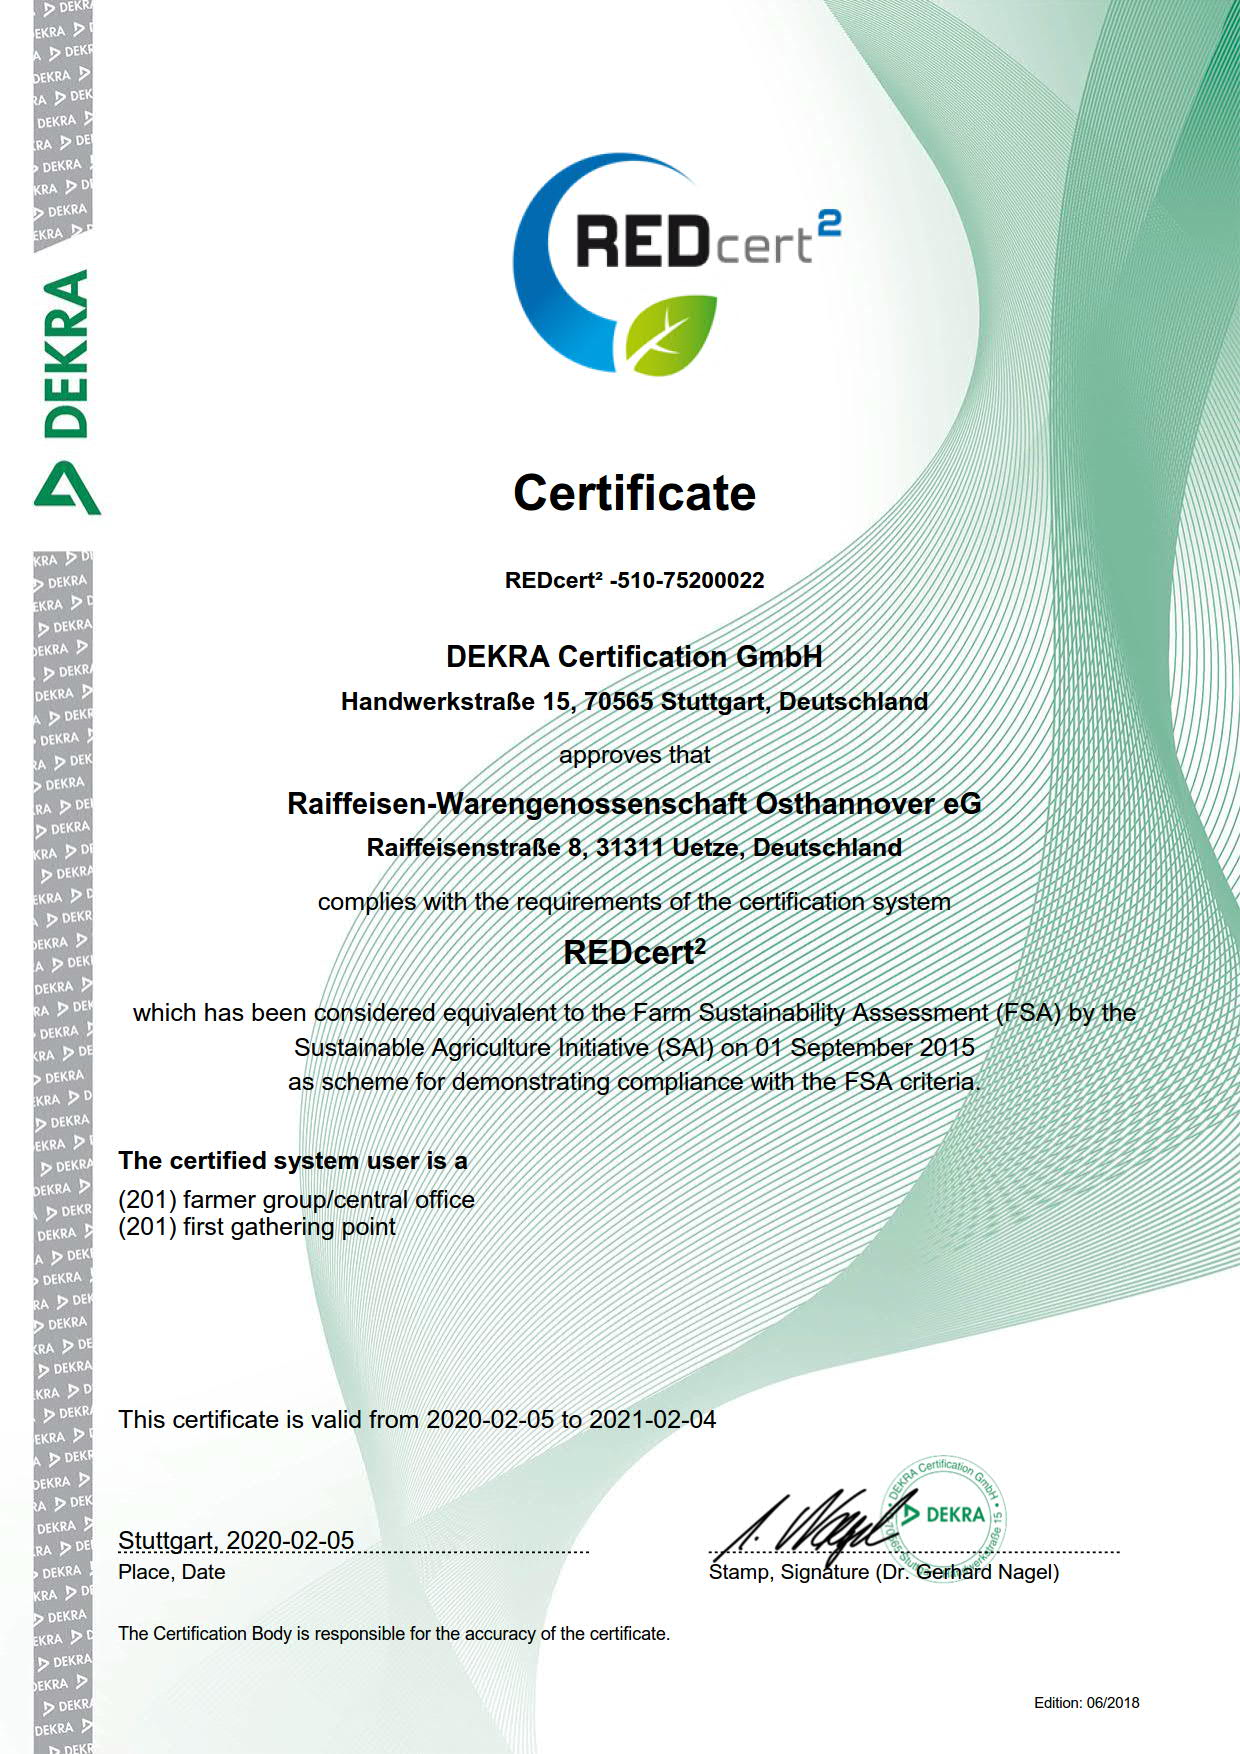 Zertifikate/2020_ZA_Zertifikat_REDcert2-2020.jpg